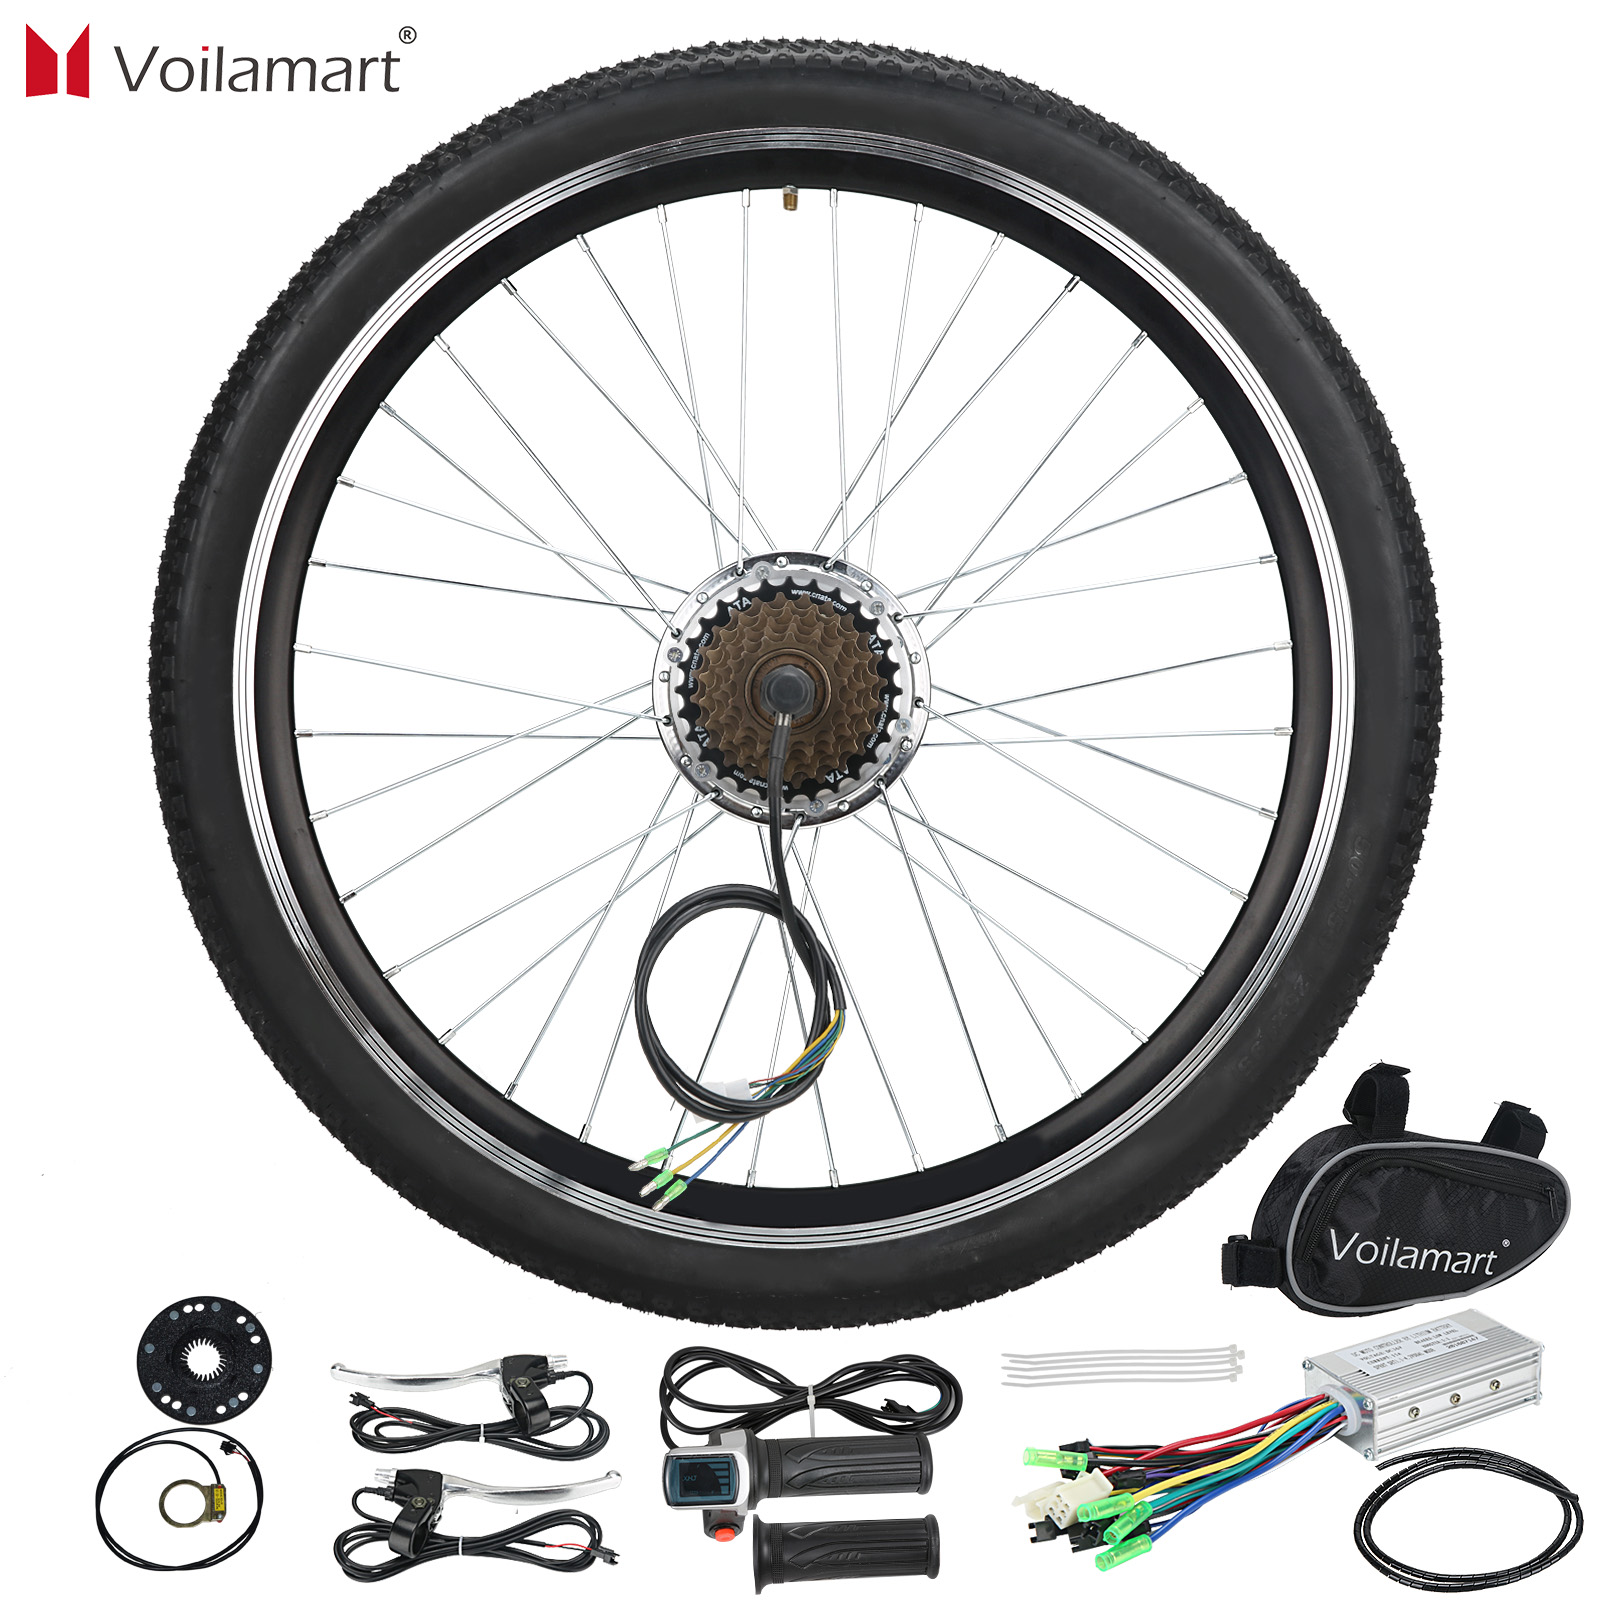 Voilamart 36V 250W Hinterrad Elektrische Fahrrad Motor Conversion Kit E Bike Radfahren Hub 26